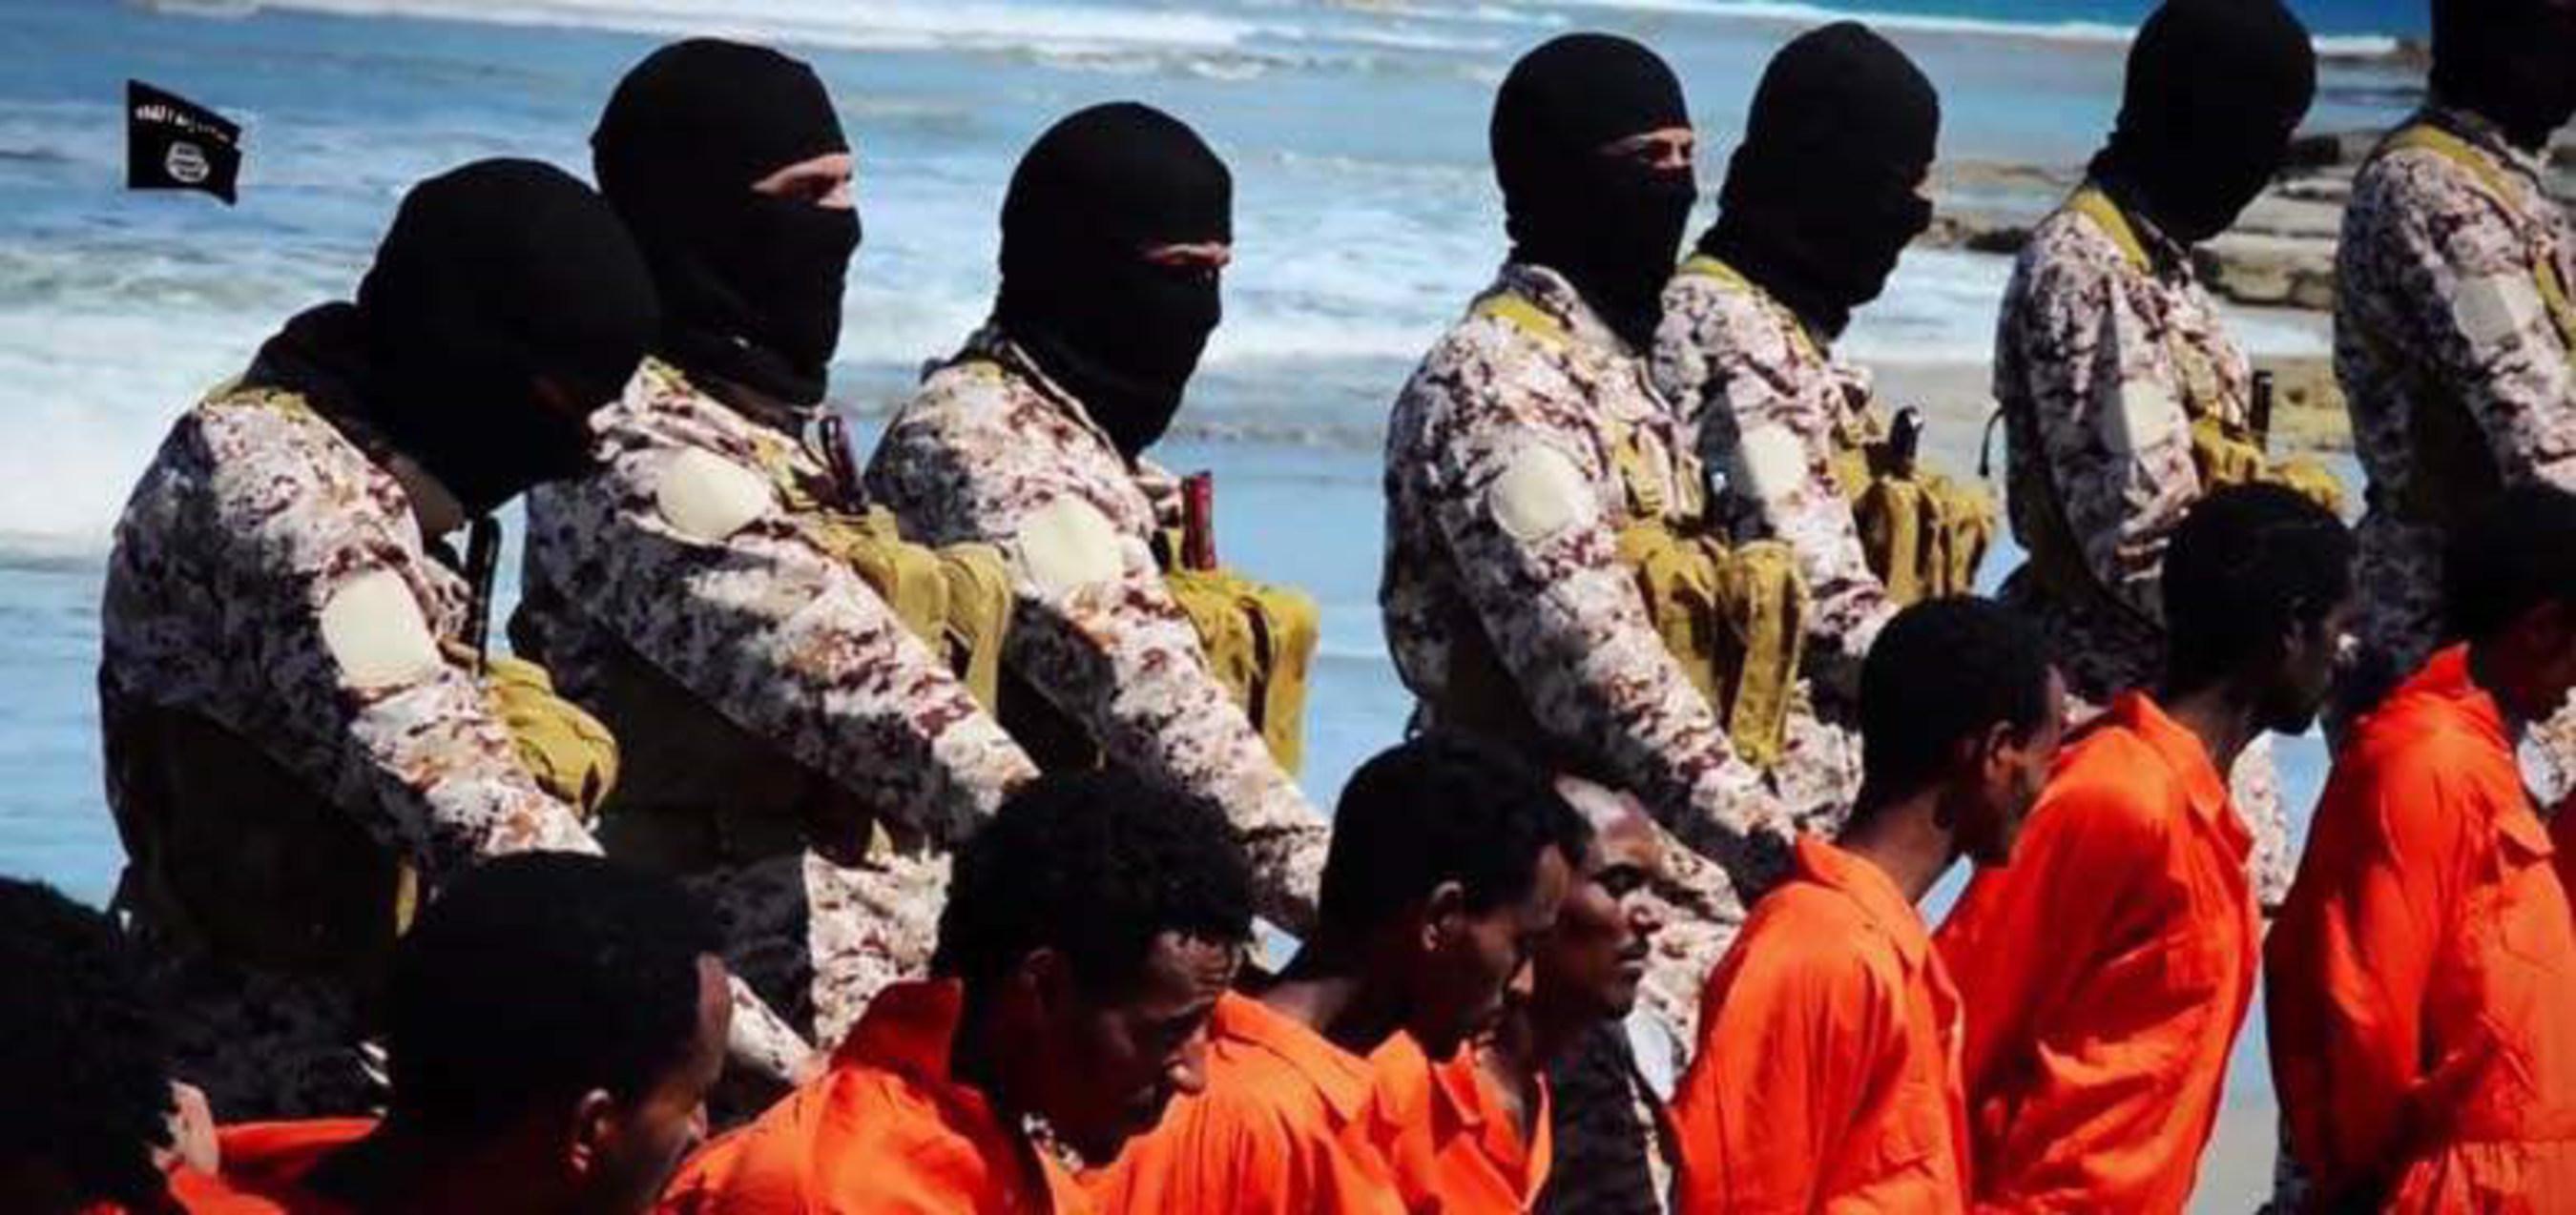 ISIS Beheads Ethiopian Christians on Libyan Beach